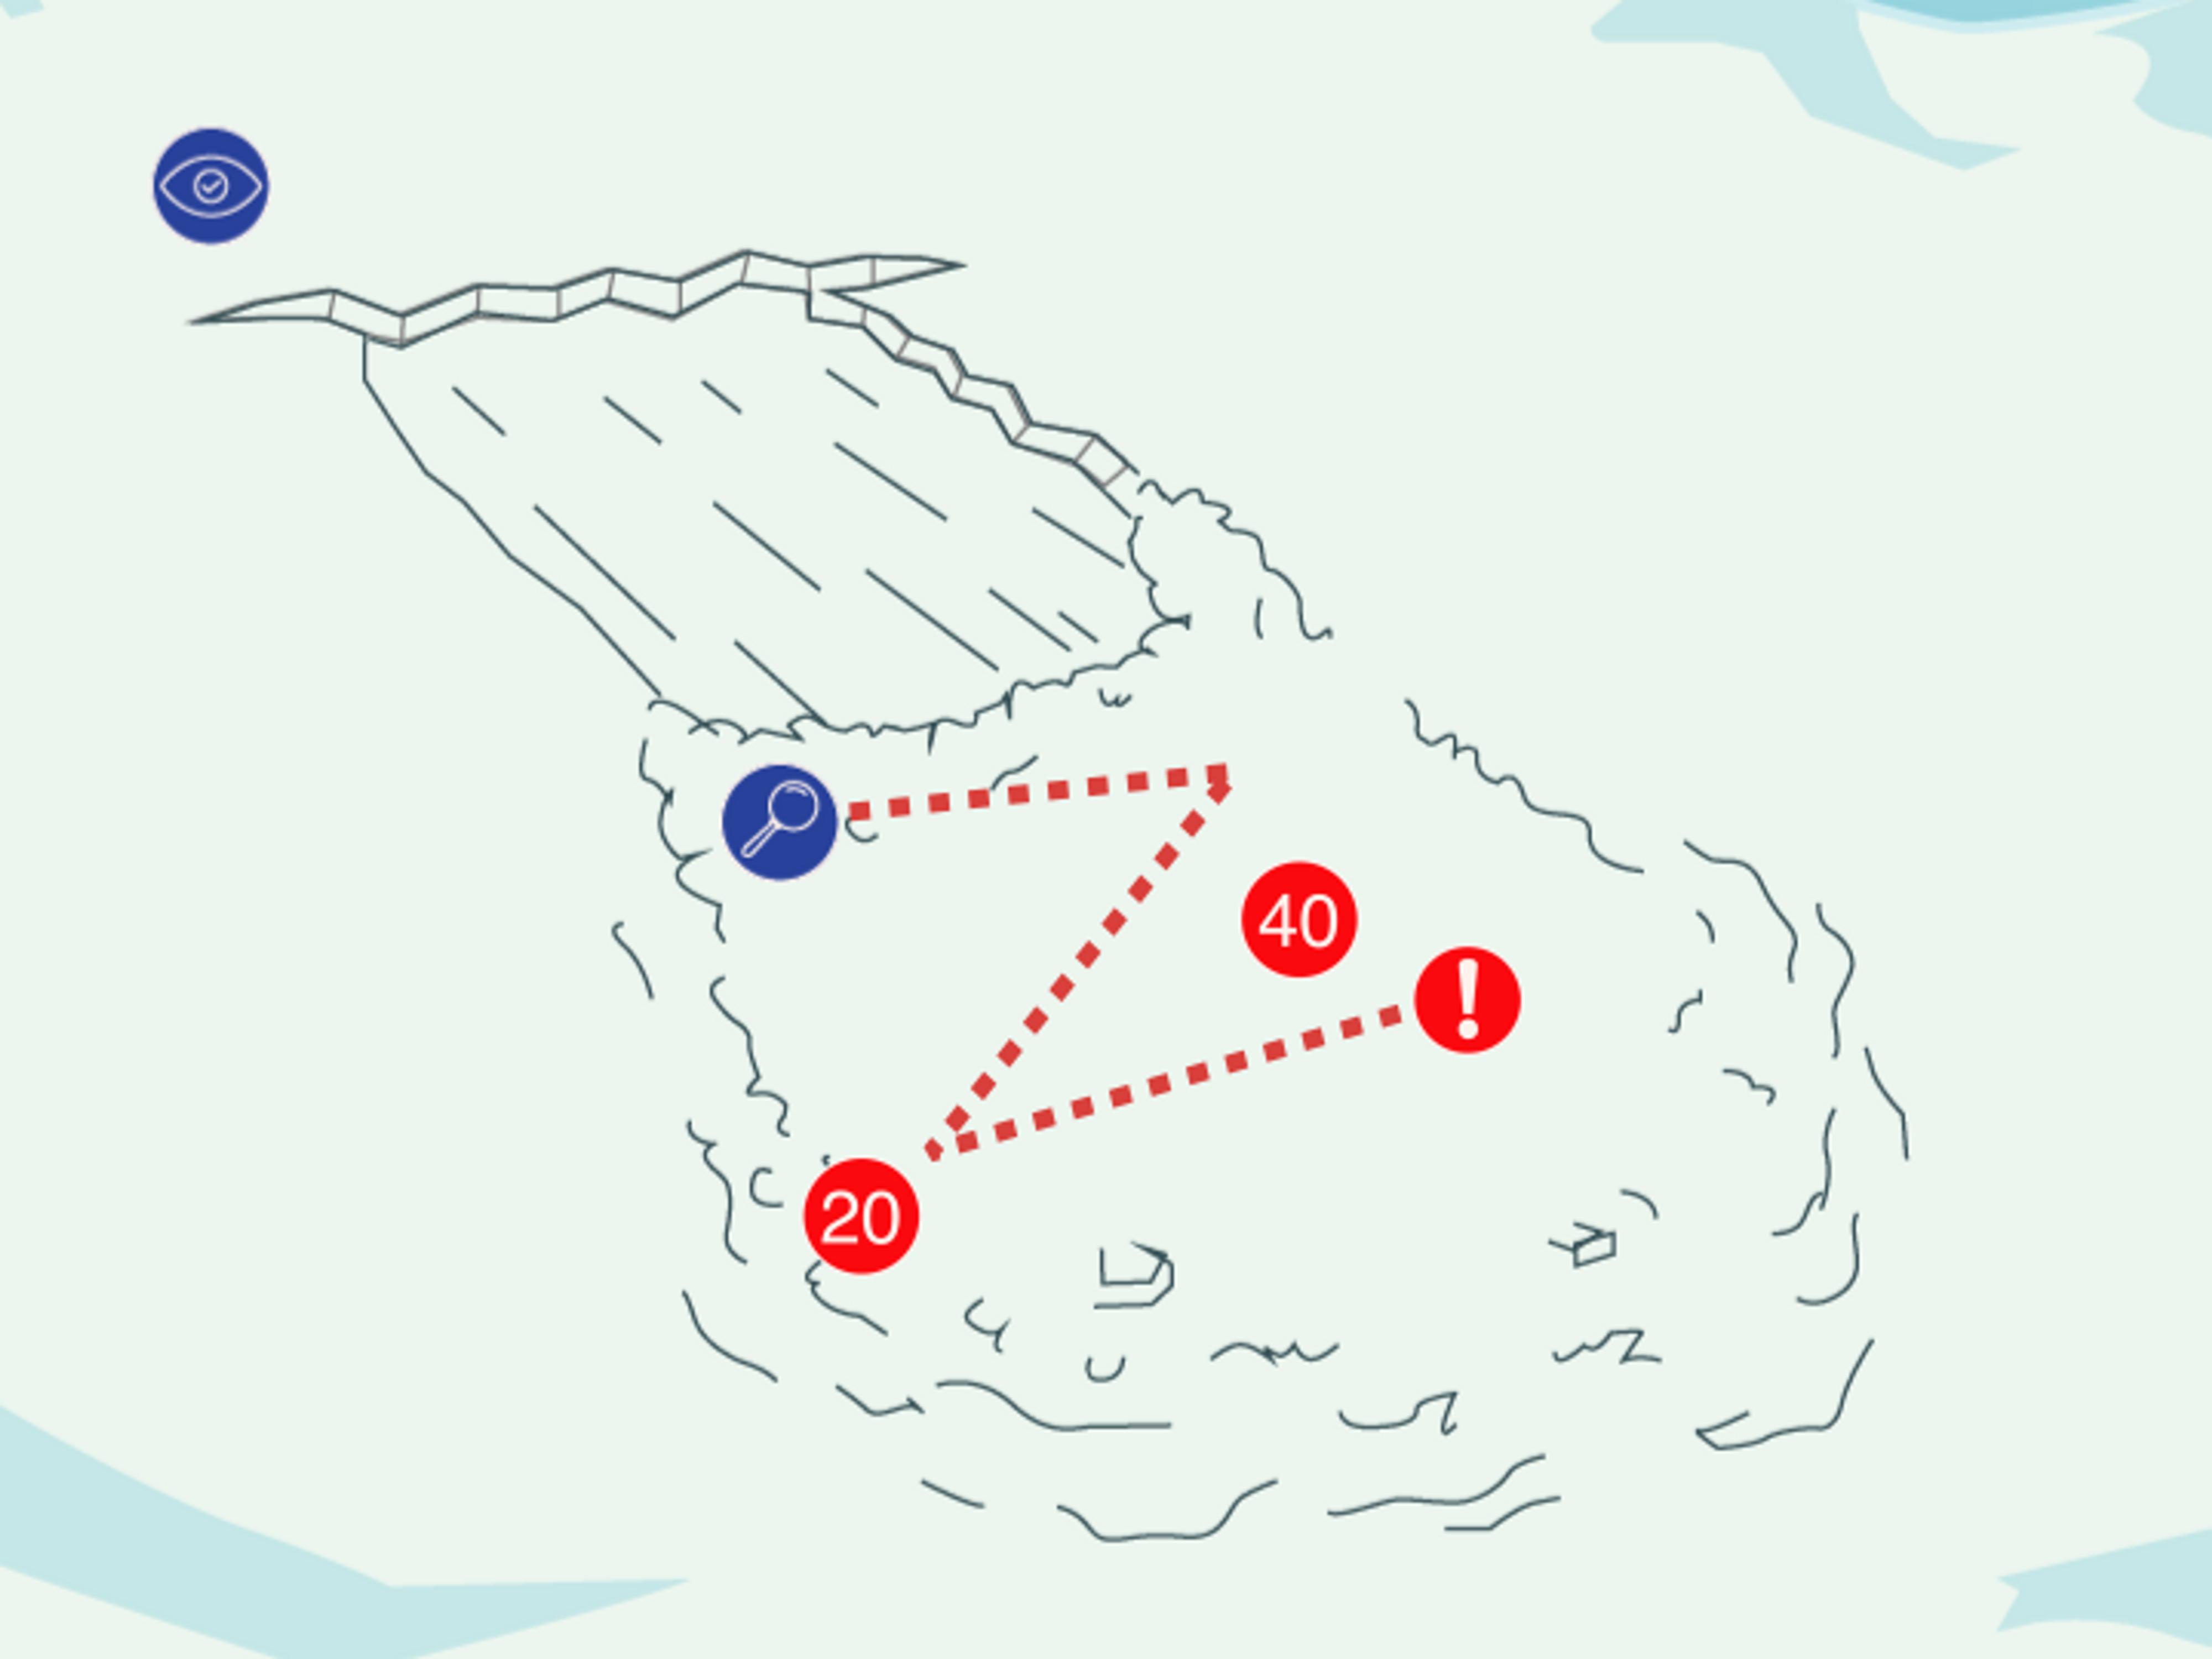 Diagram shows single searcher signal search